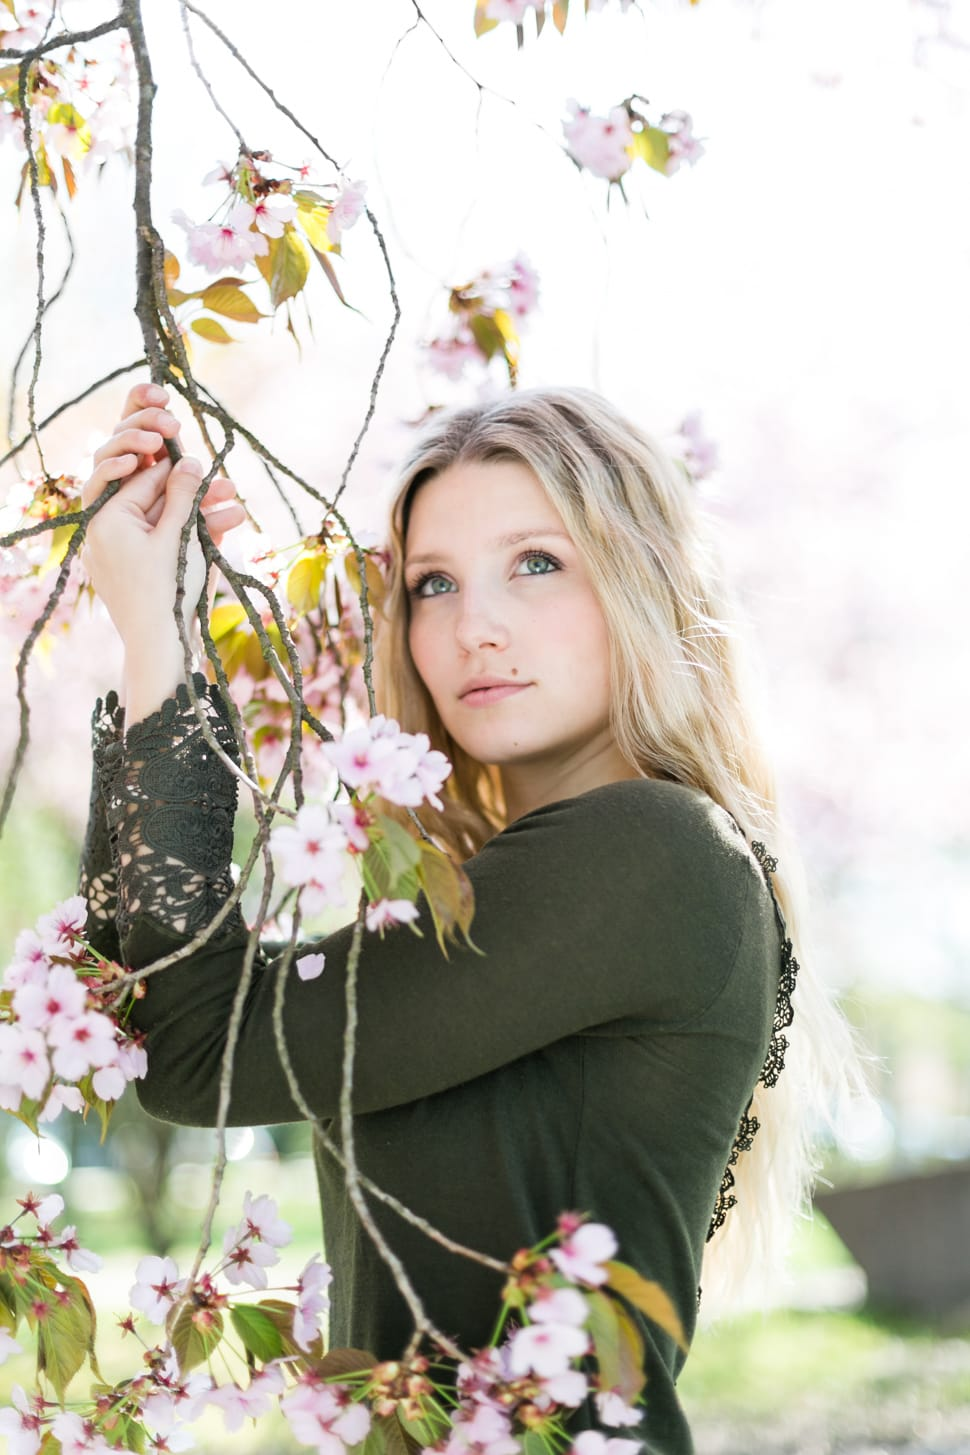 Frühlingsfotos in Weiden